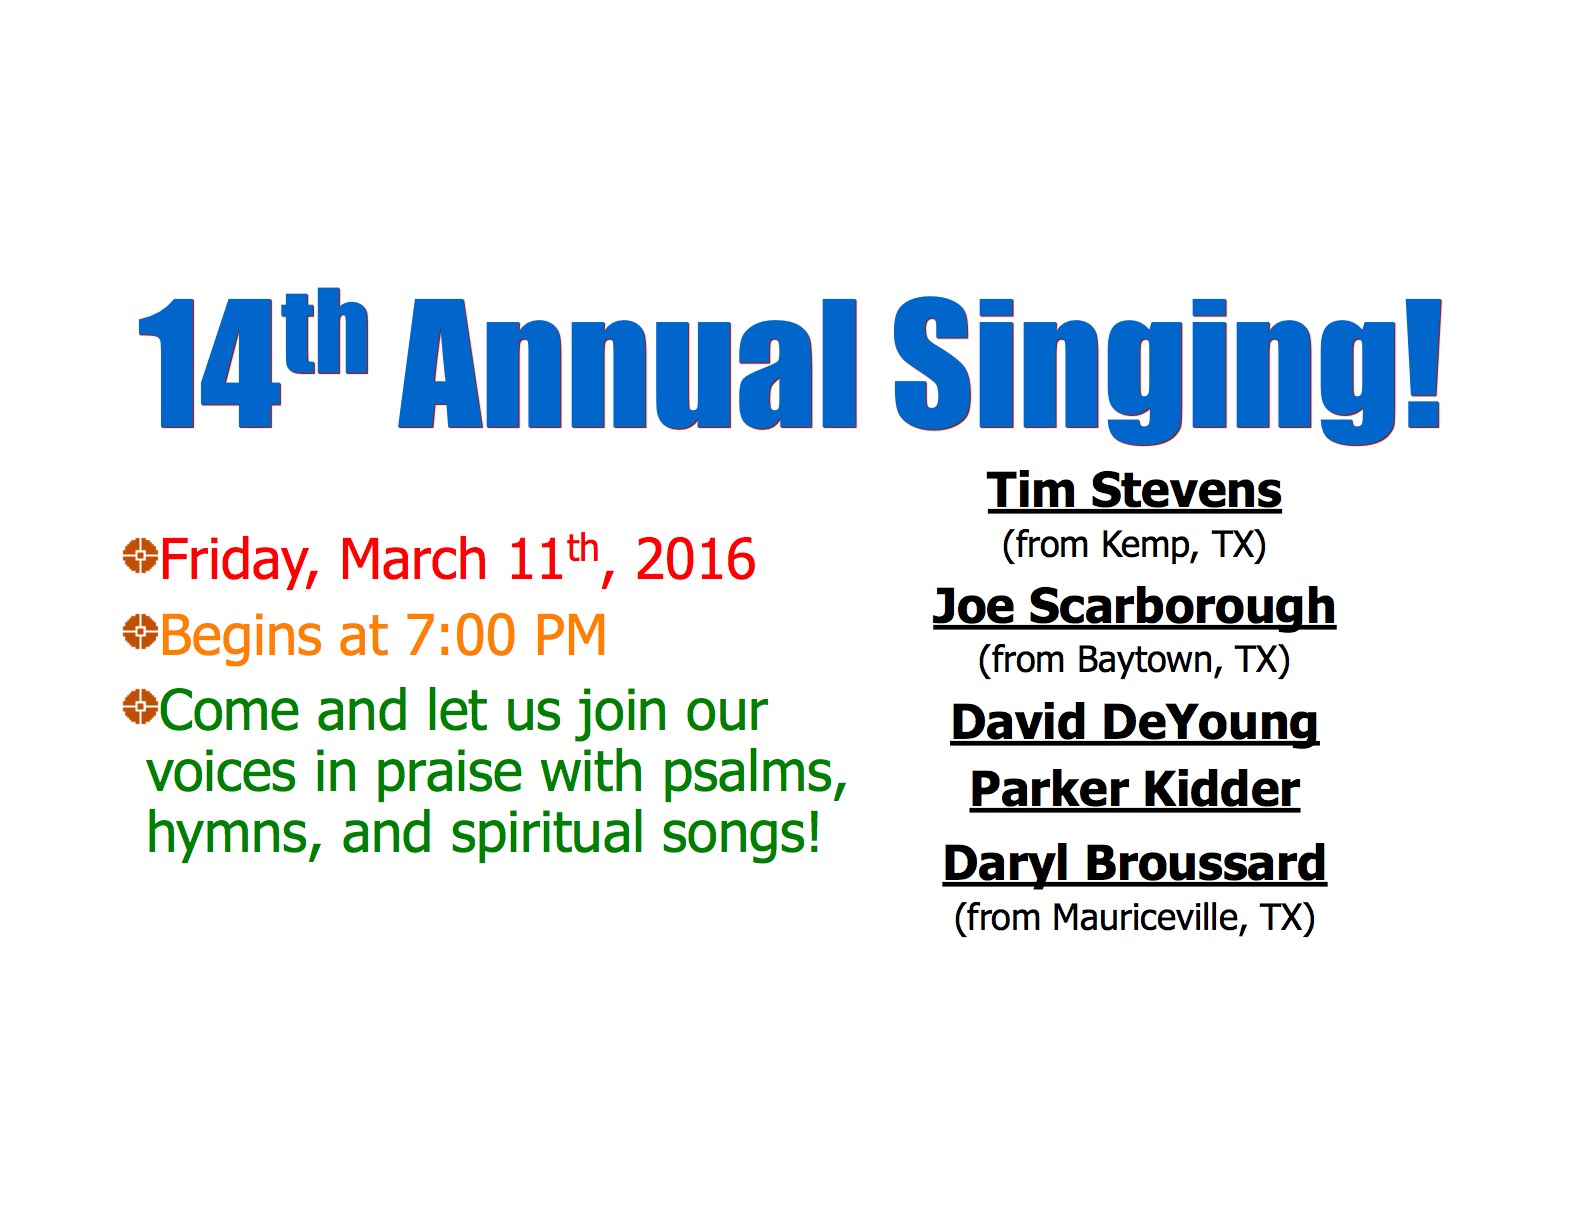 14th Annual Singing